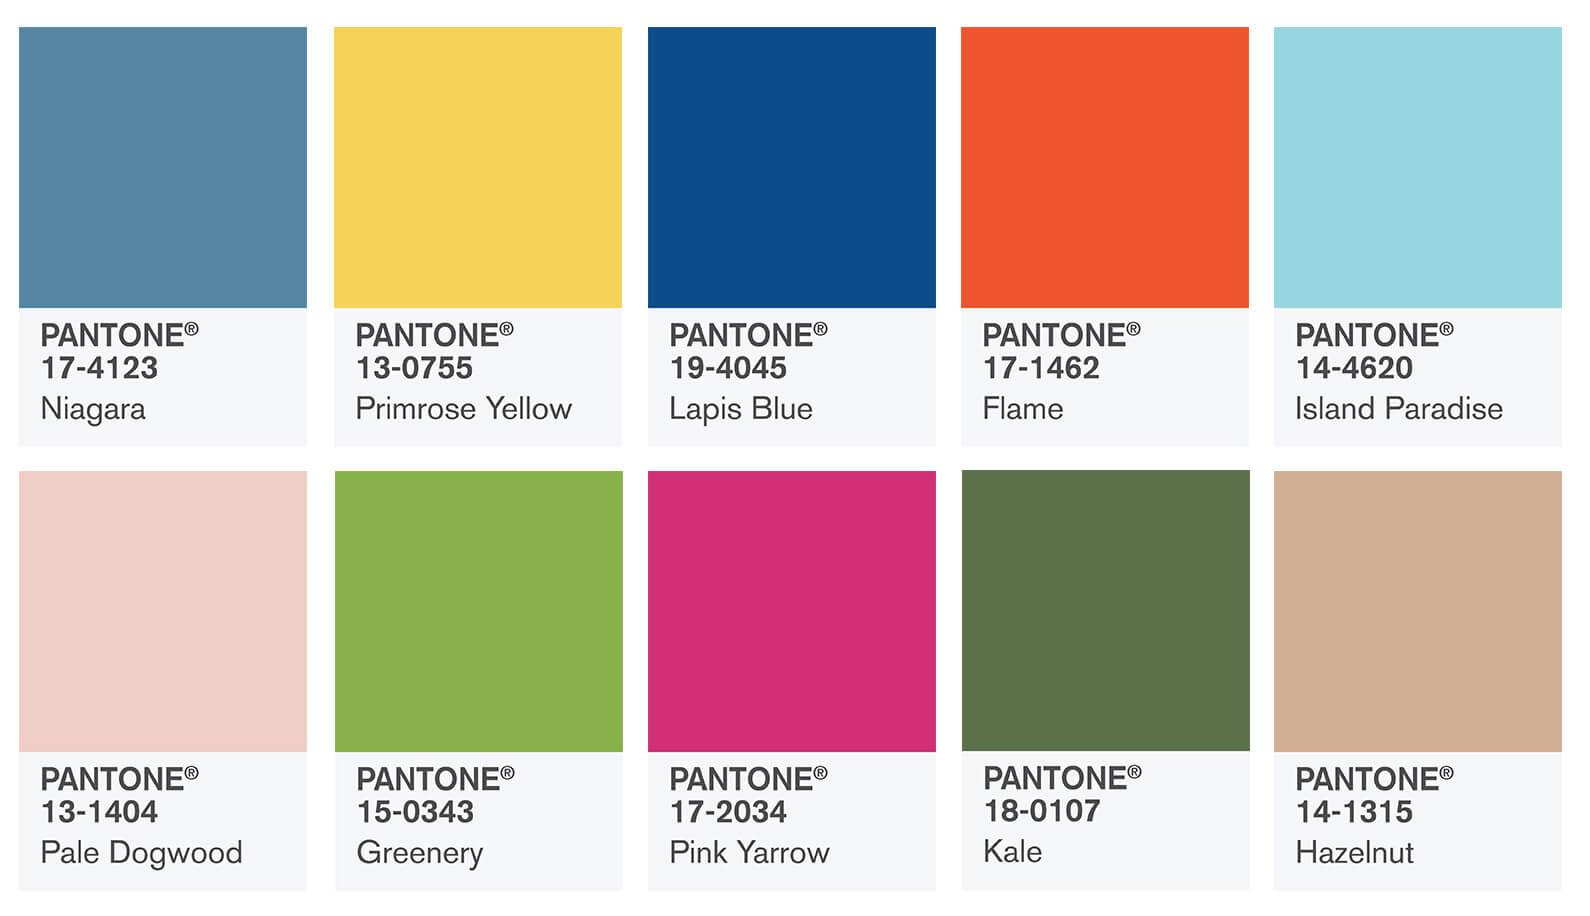 Spring 2017 Fashion Color Report